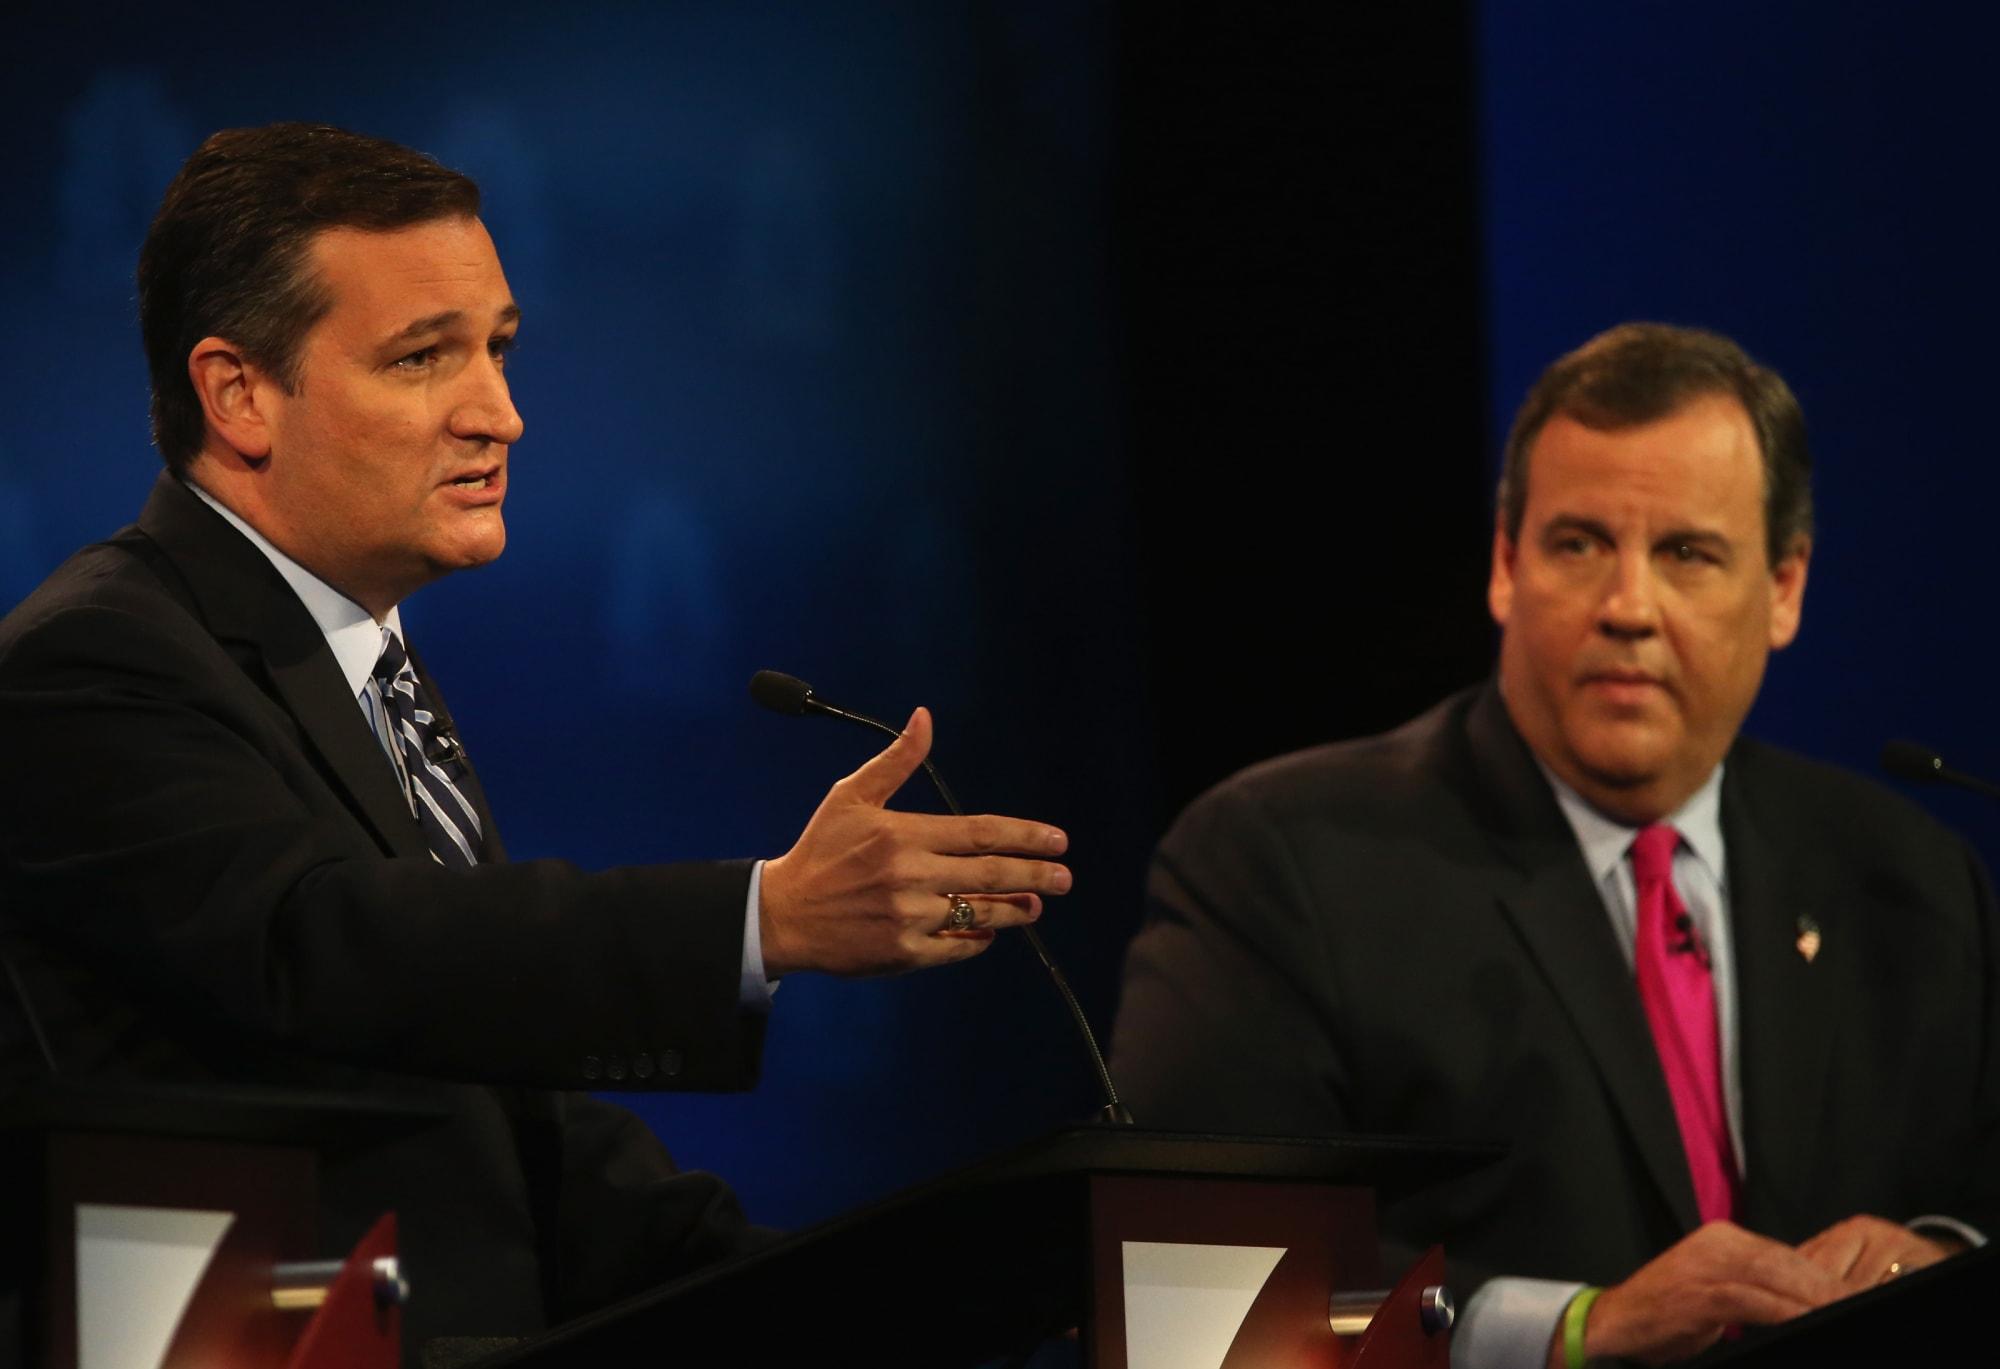 Stephen Colbert dismisses Ted Cruz, Chris Christie for Biden criticism